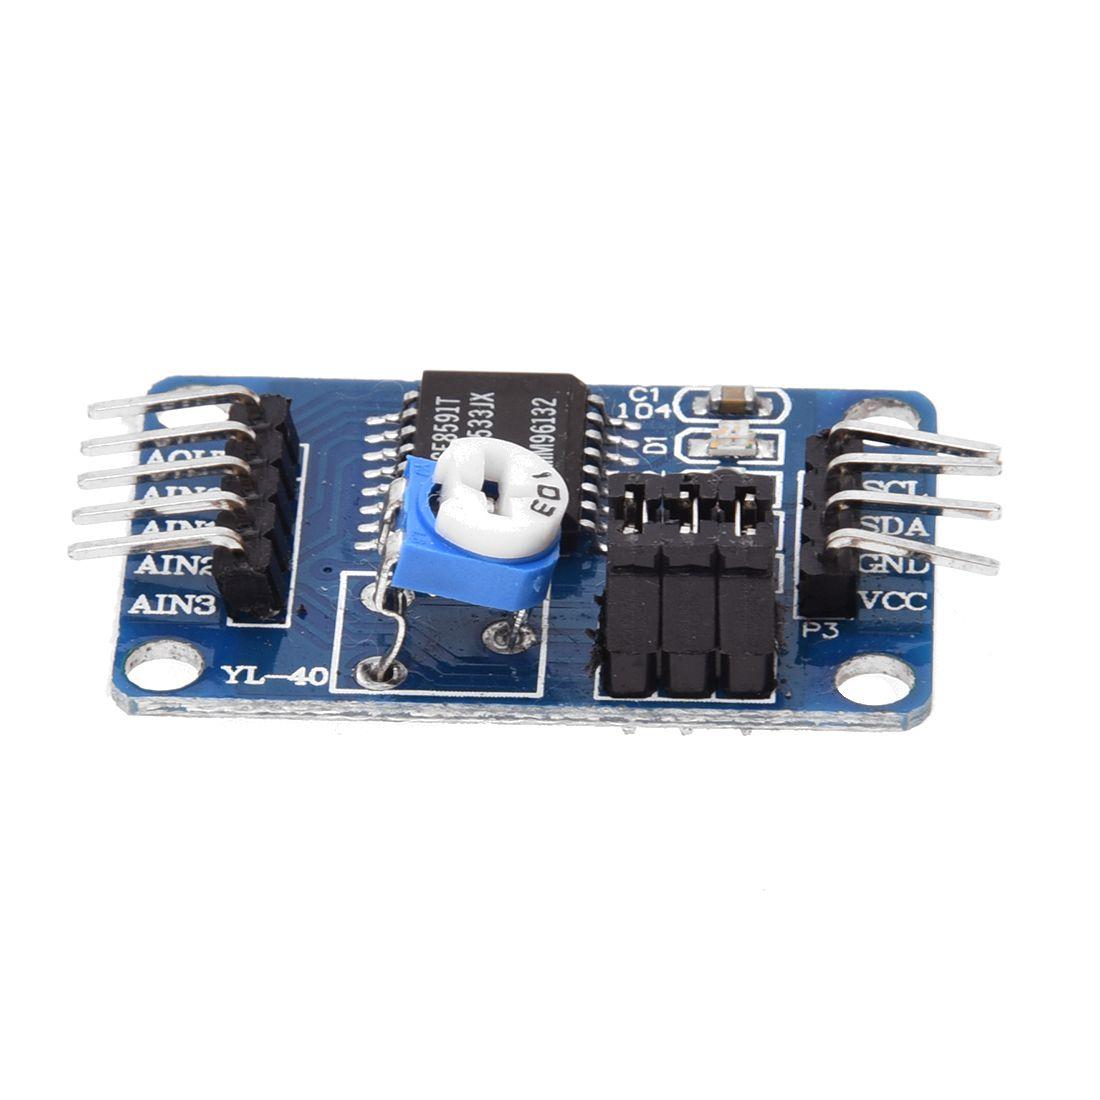 Pcf8591 Ad Da Converter Module Modules Analog To Digital Converters Conversion For A V8c6